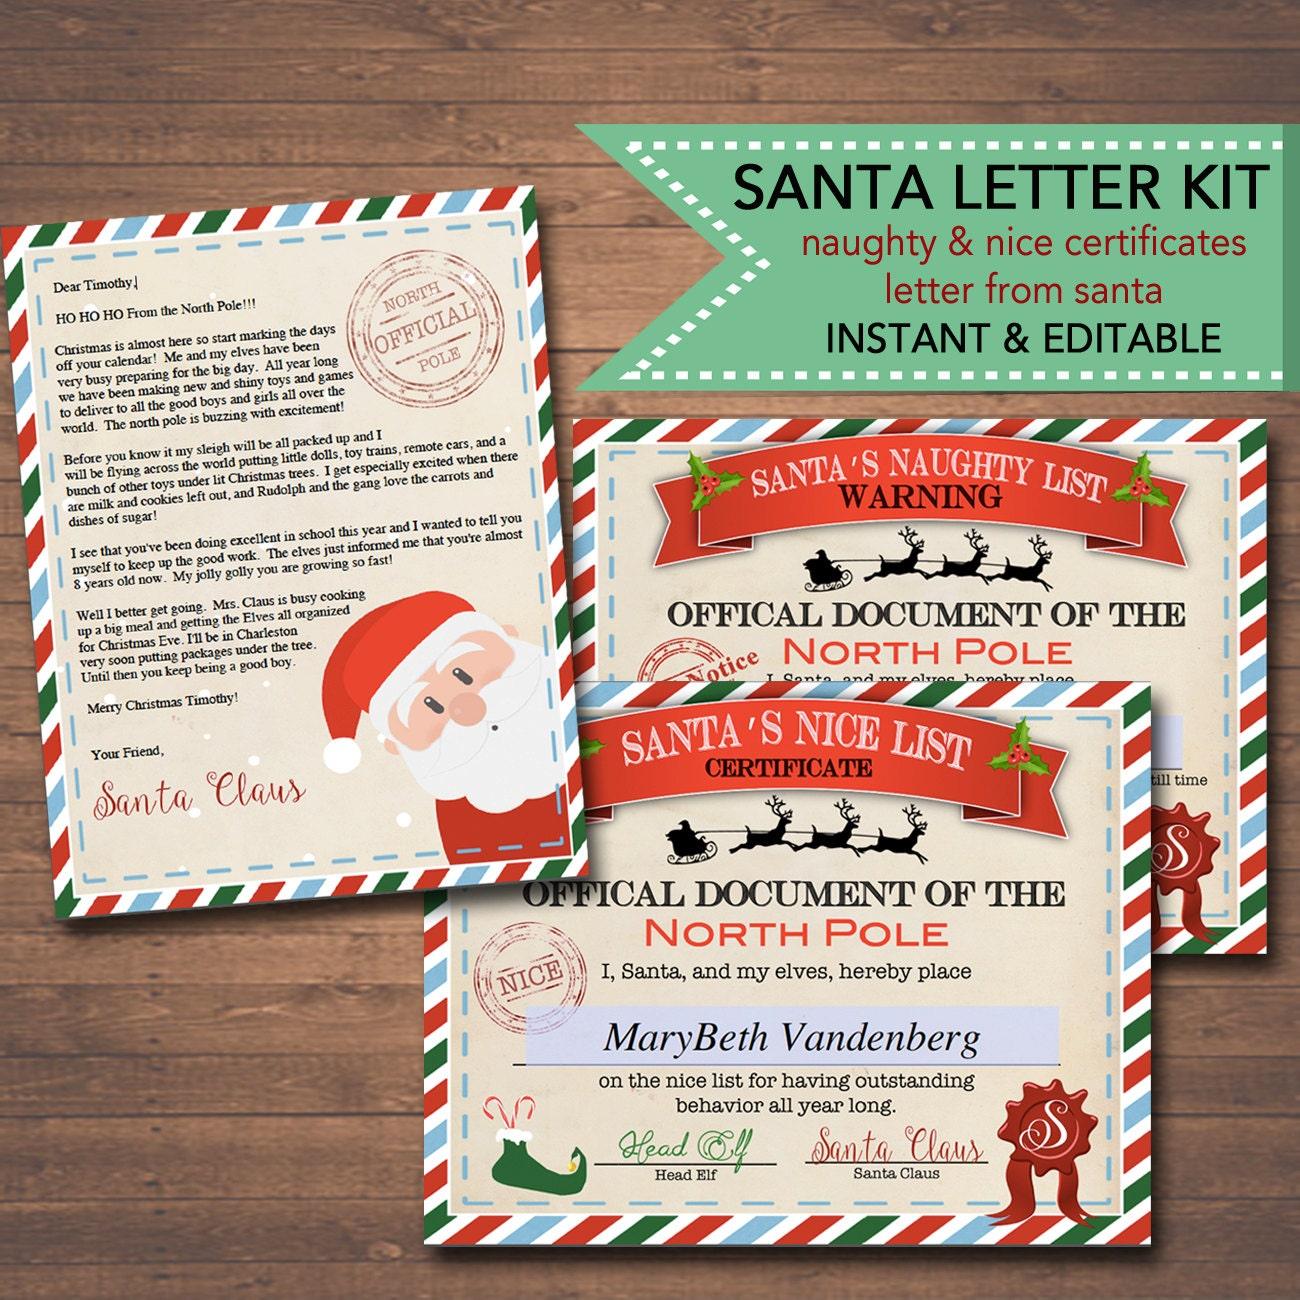 santa letter editable nice naughty certificates santa letter christmas reward certificate santa s nice list letter from santa template instant